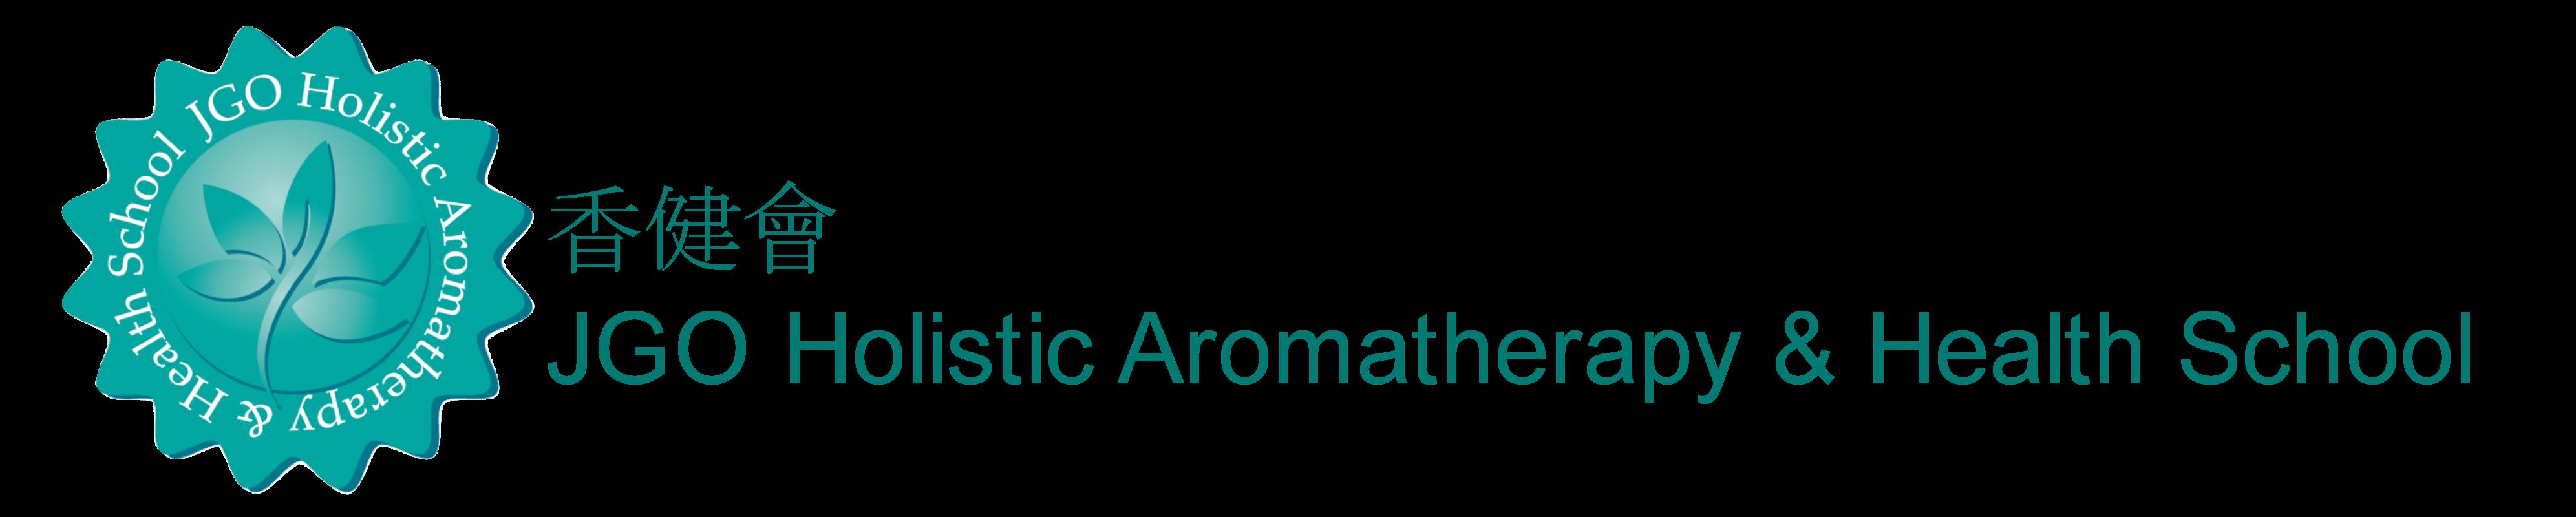 JGO Hoslistic Aromatherapy & Health School